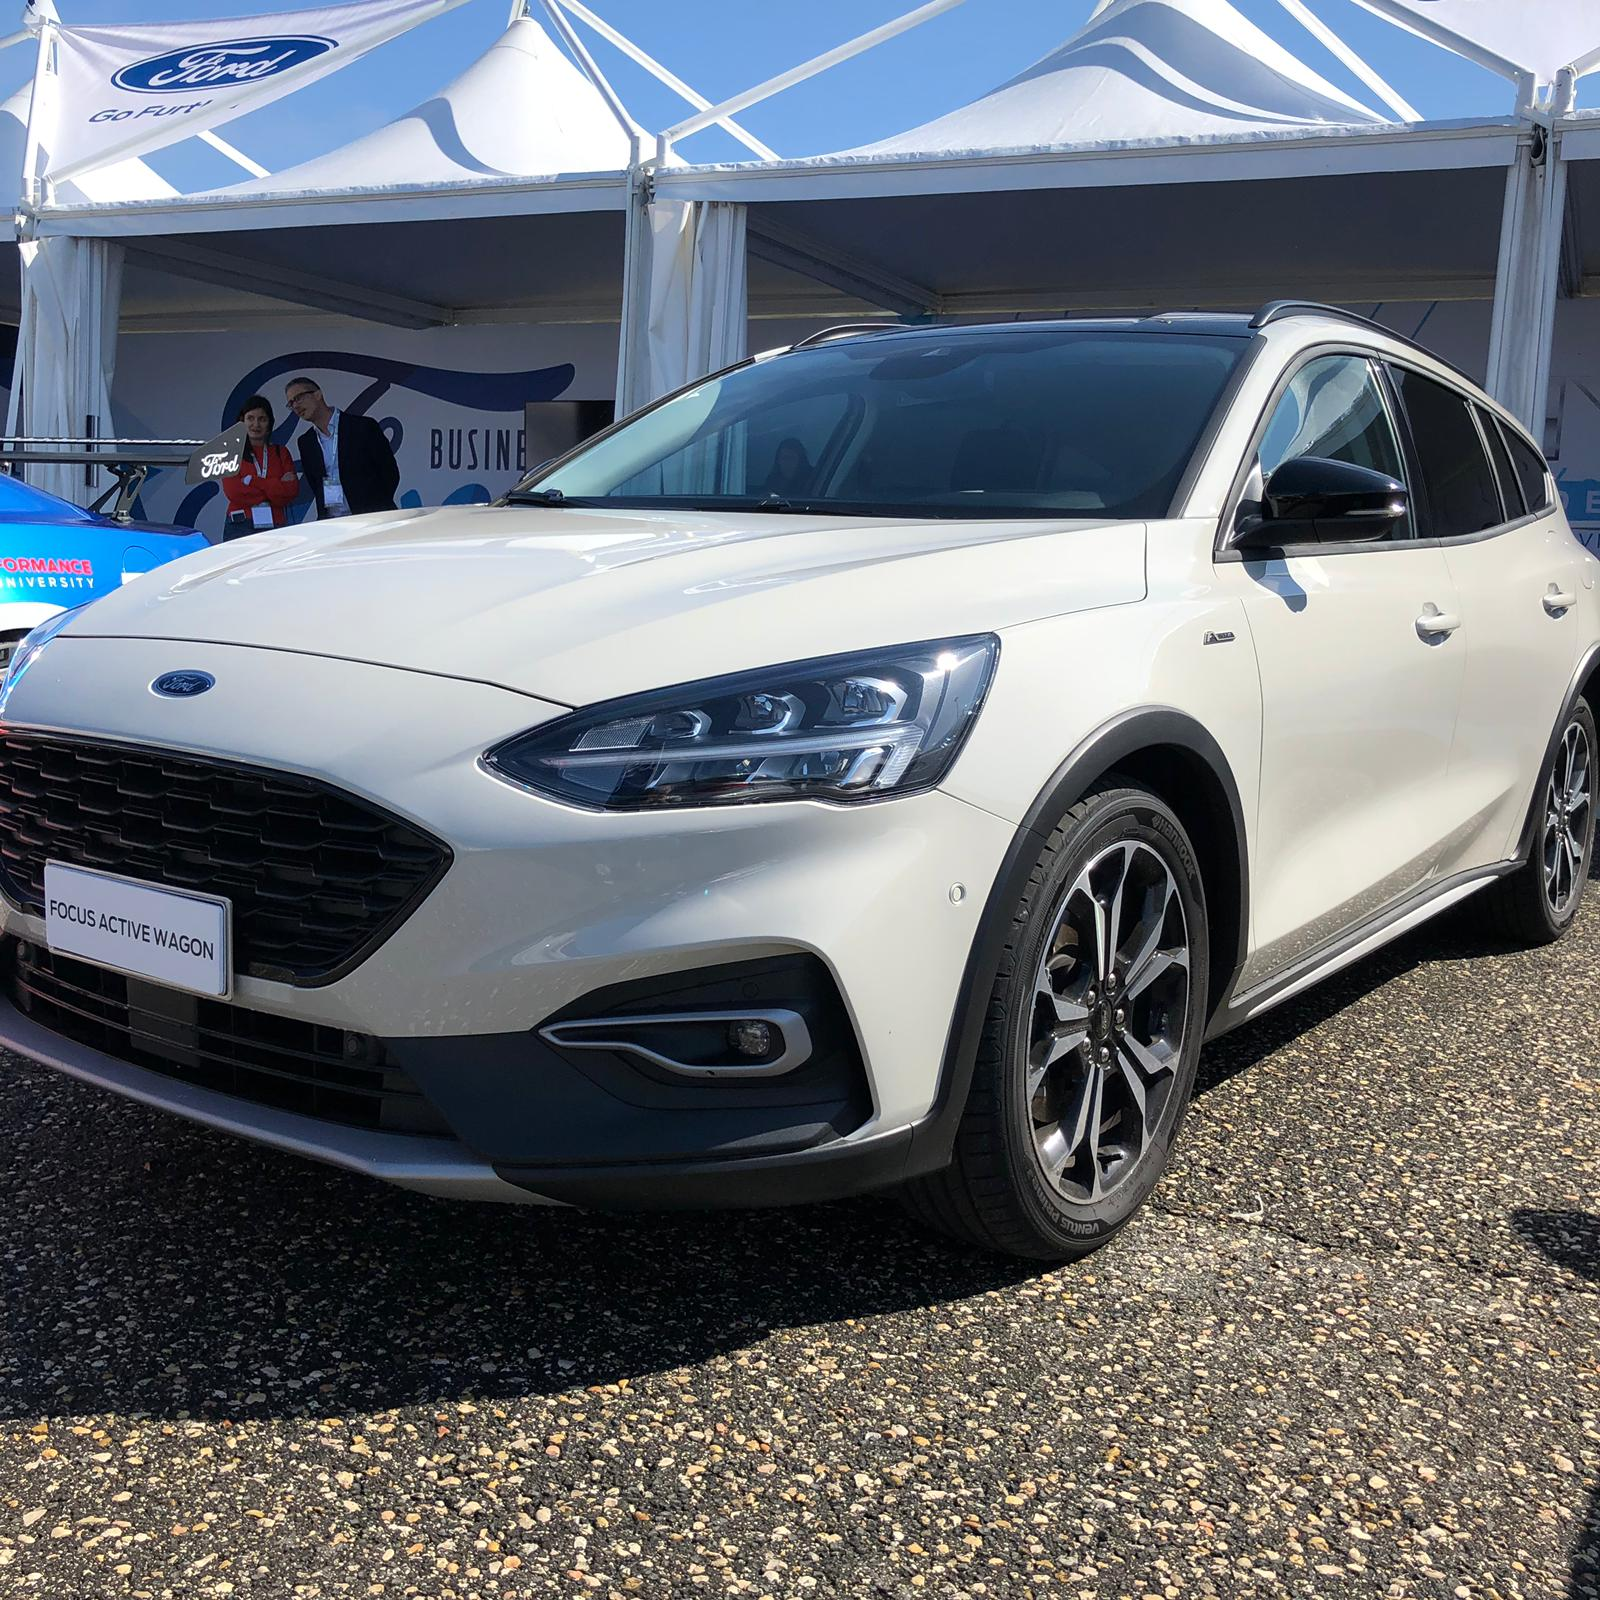 nuova-ford-focus-active-wagon-anteprima-fleet-motor-day-2019